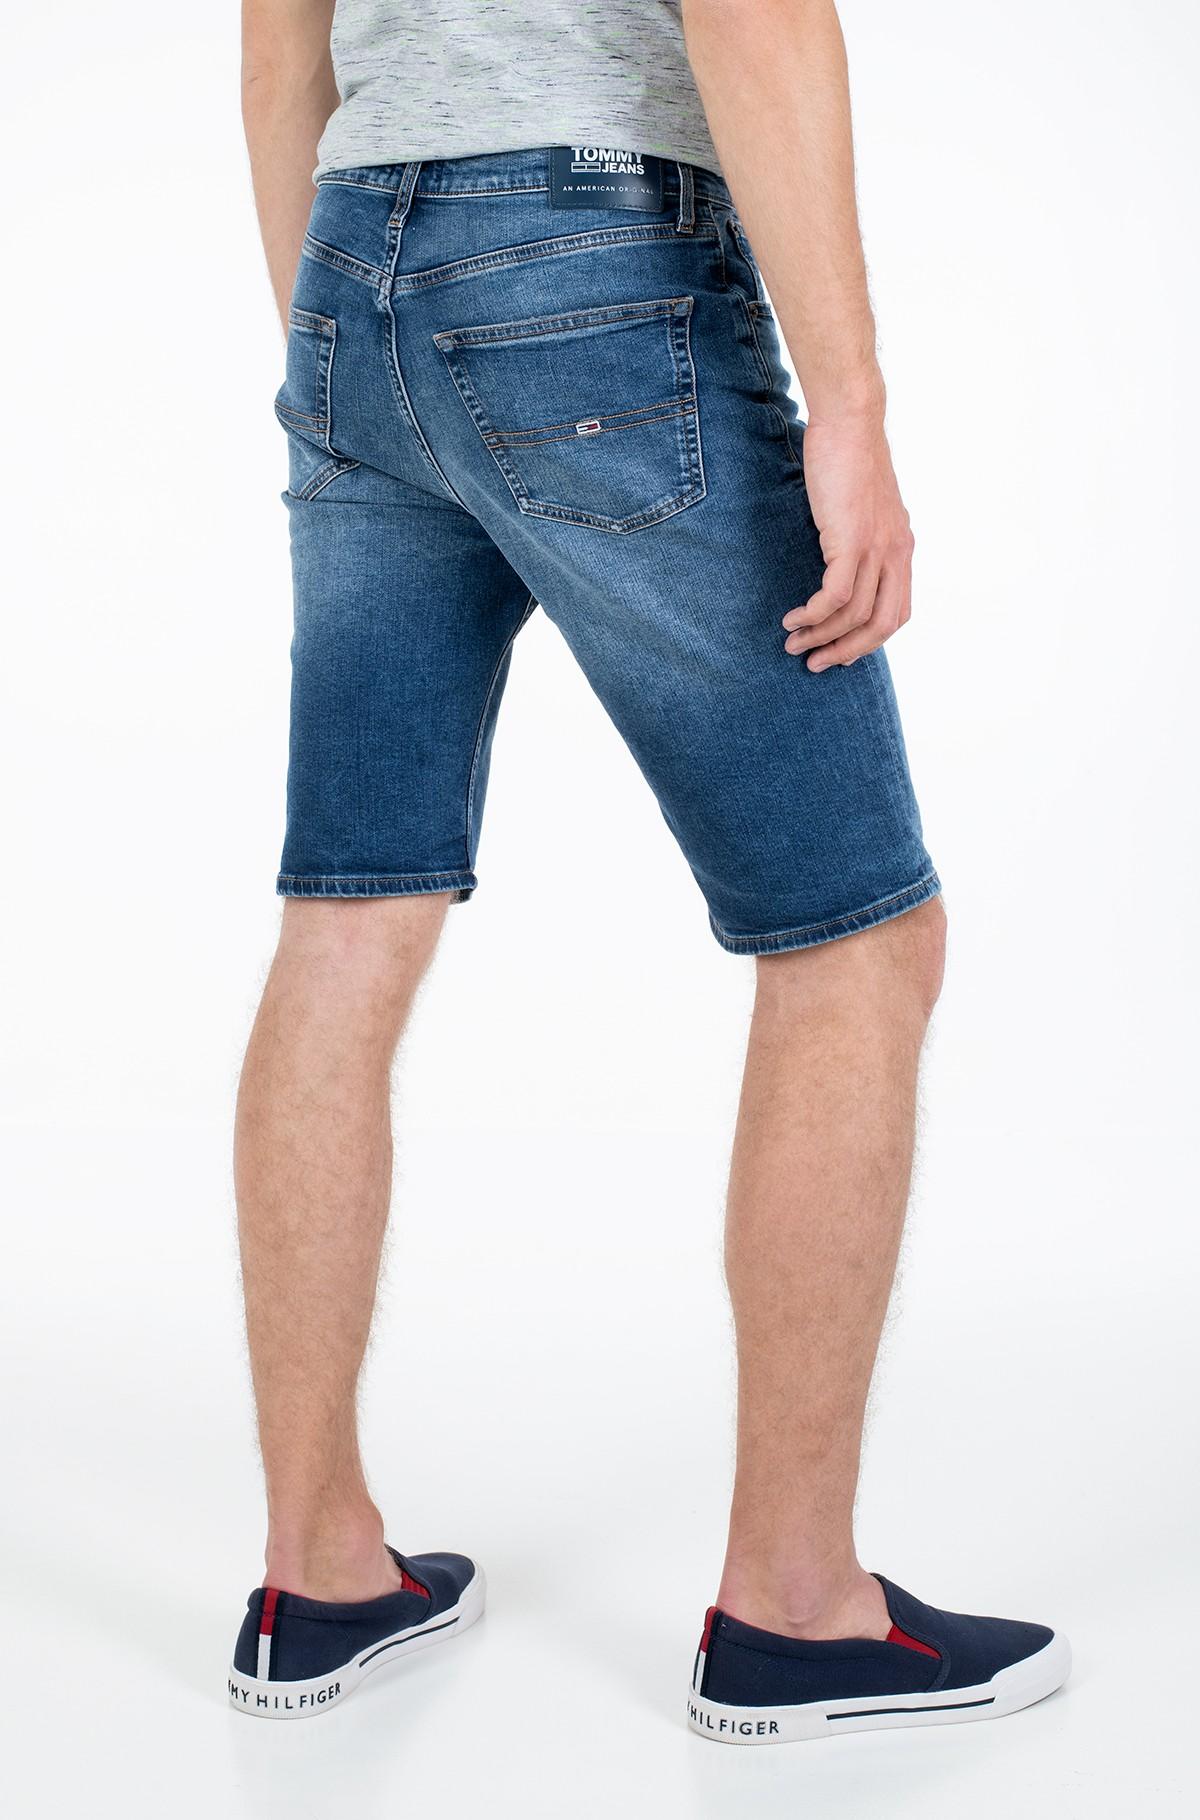 Lühikesed püksid REY RELAXED SHORT NCKM-full-2